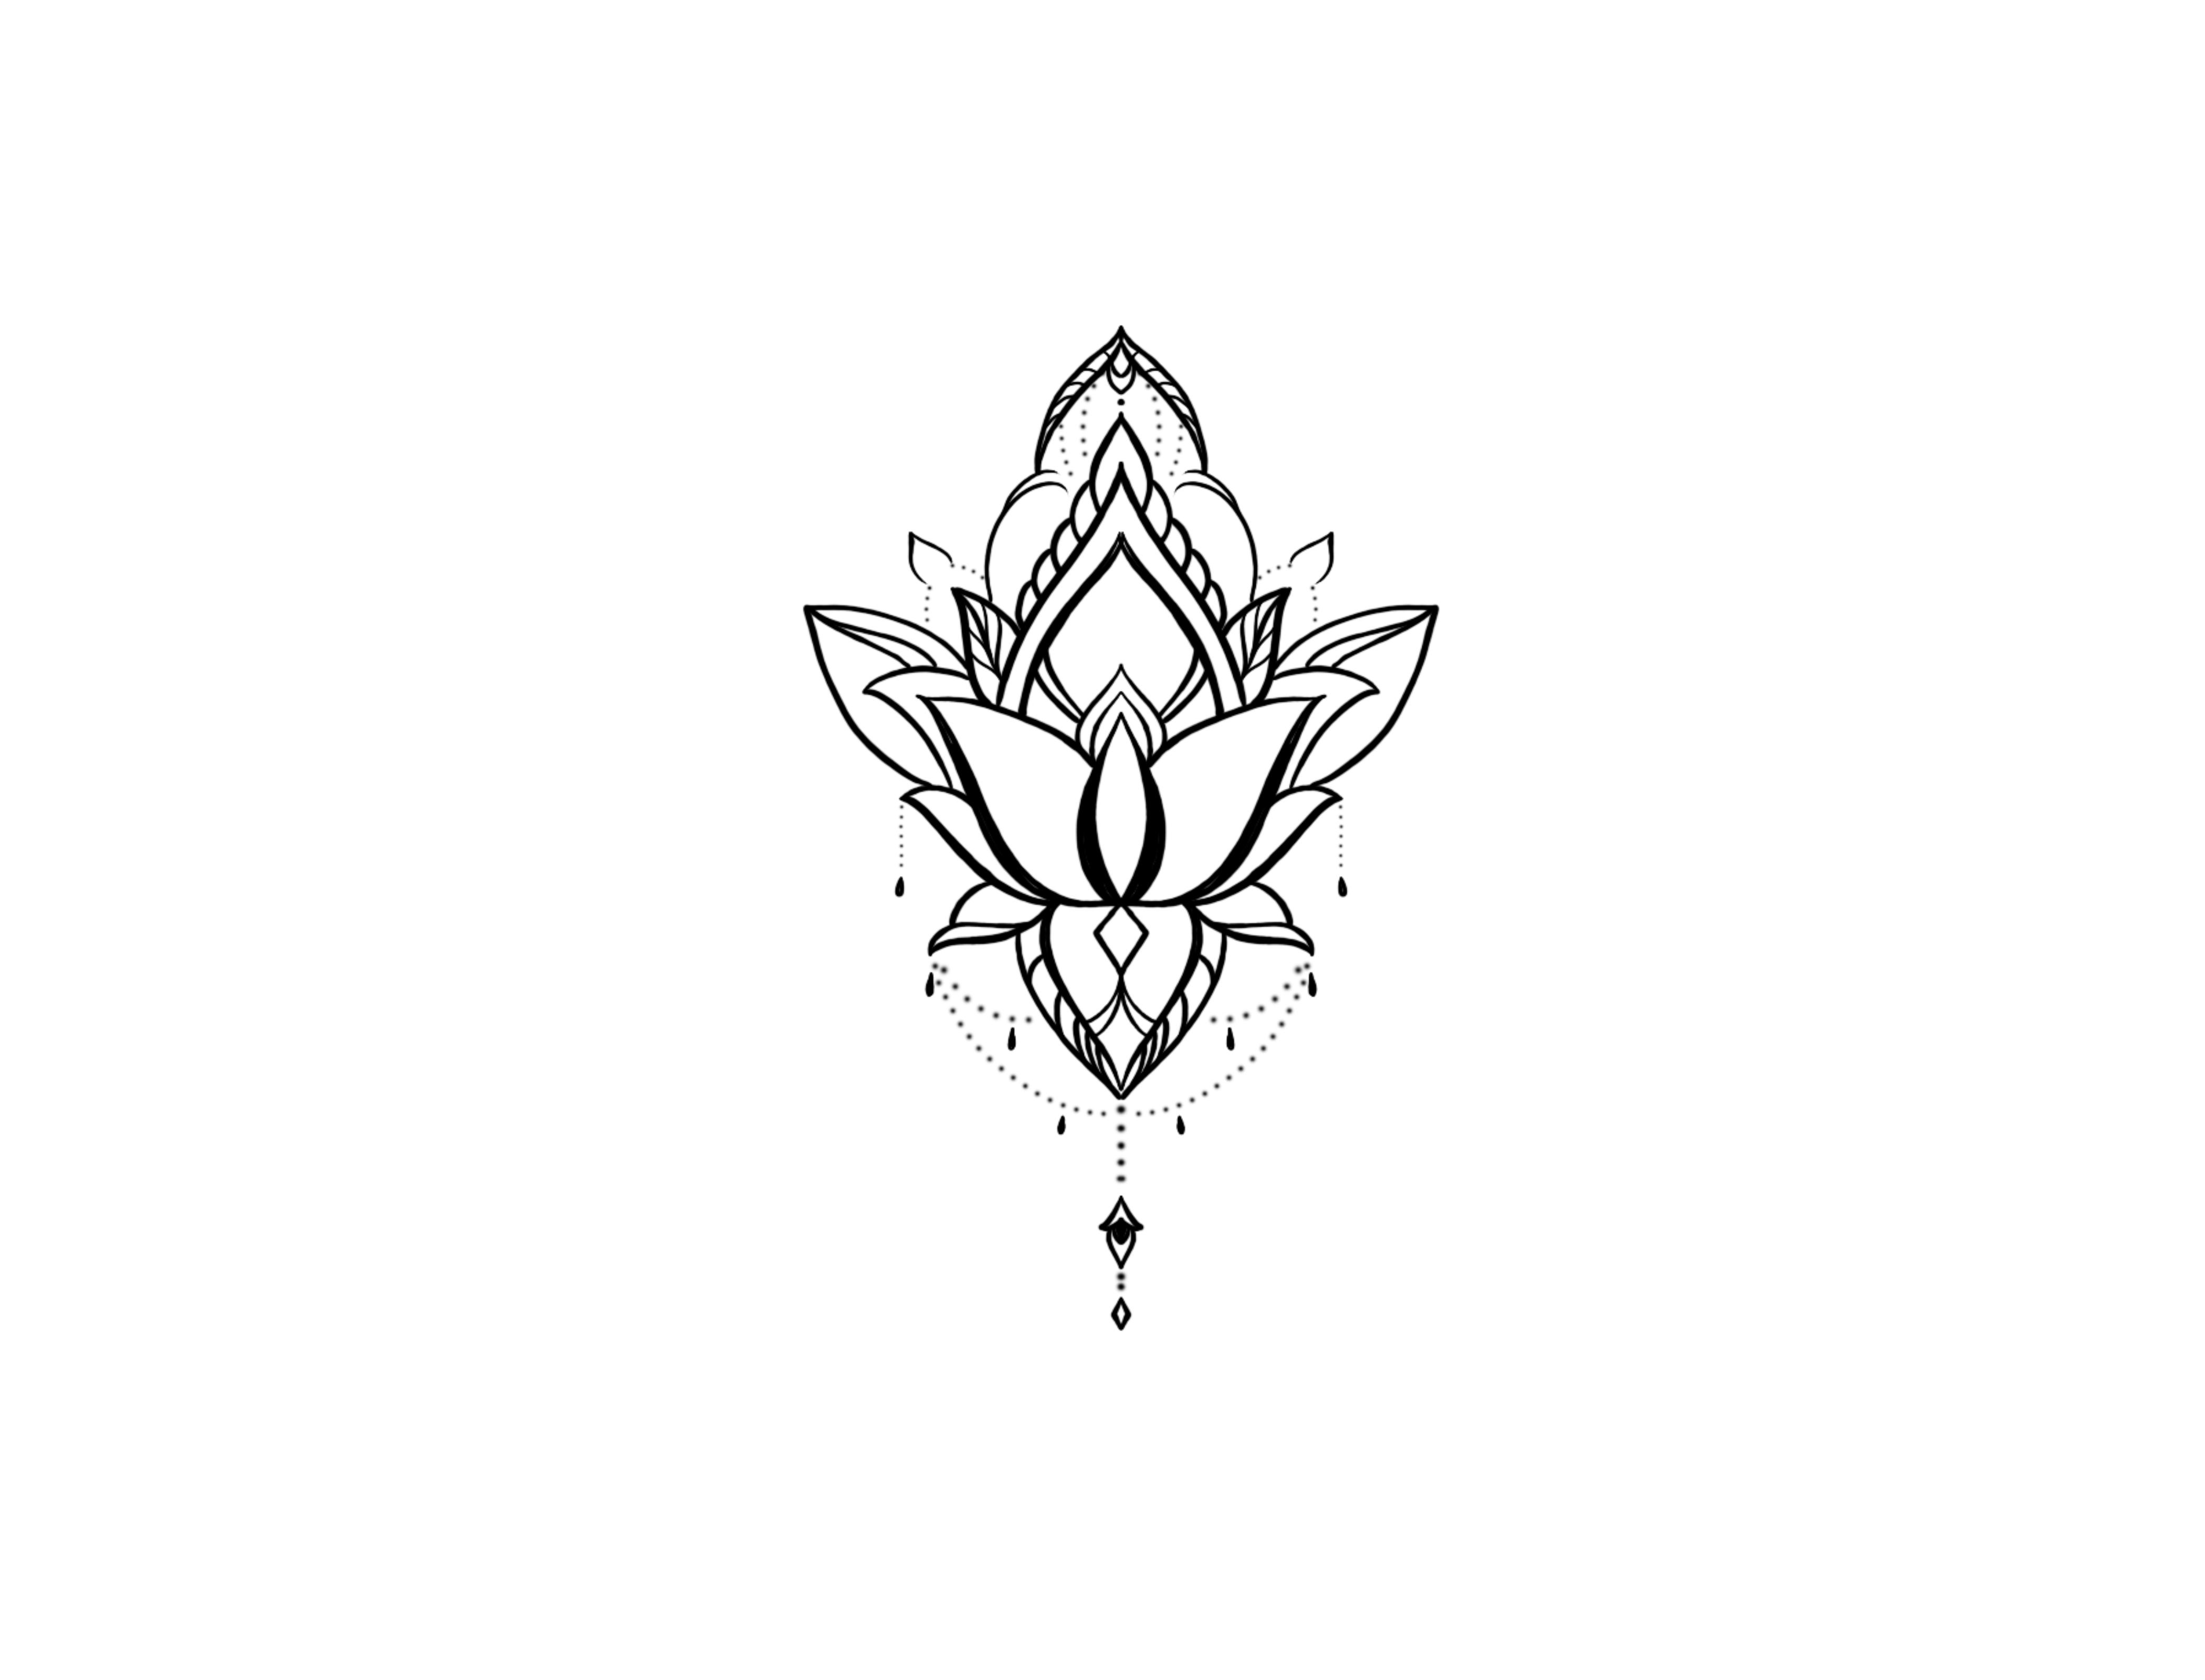 Lotus Botao Flower Tatuagens Minimalistas Minitatuagens Tatuagens